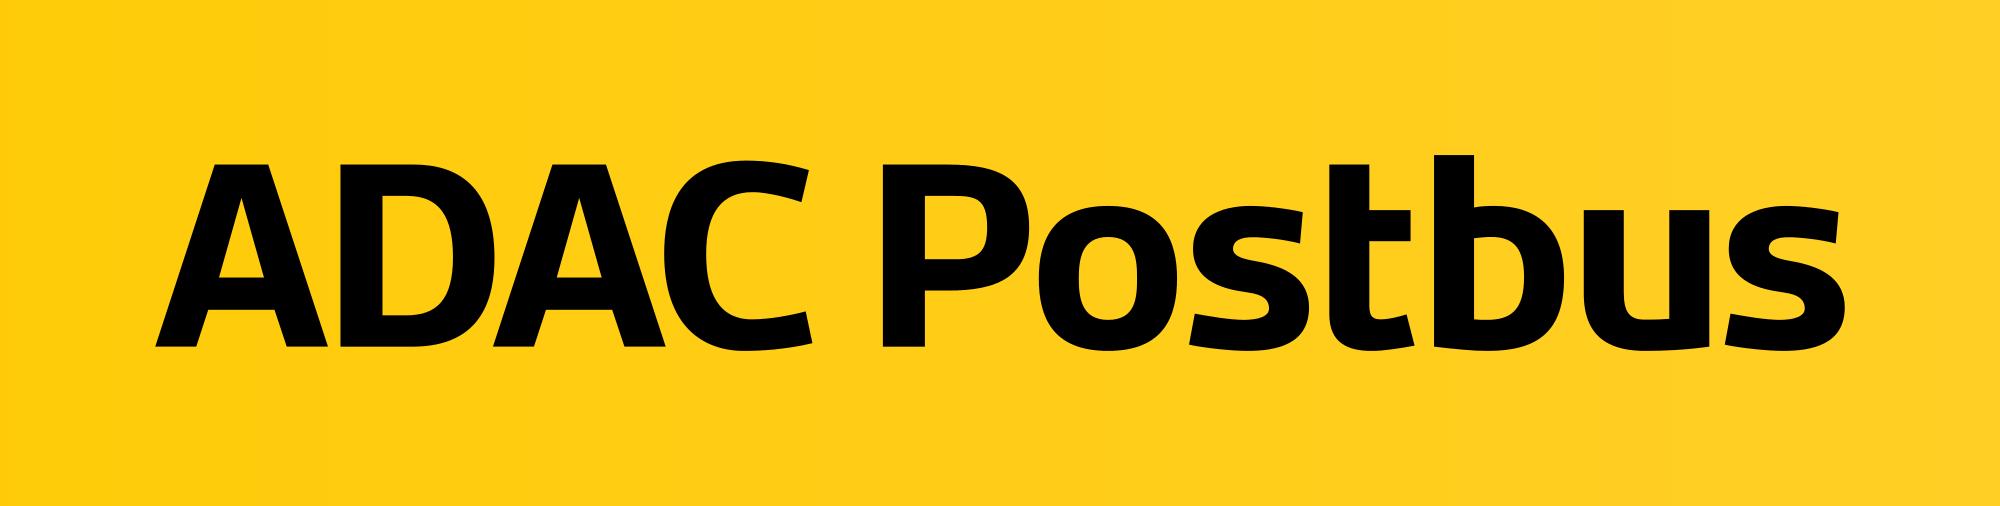 Adac Postbus Logo - Adac Logo Vector PNG